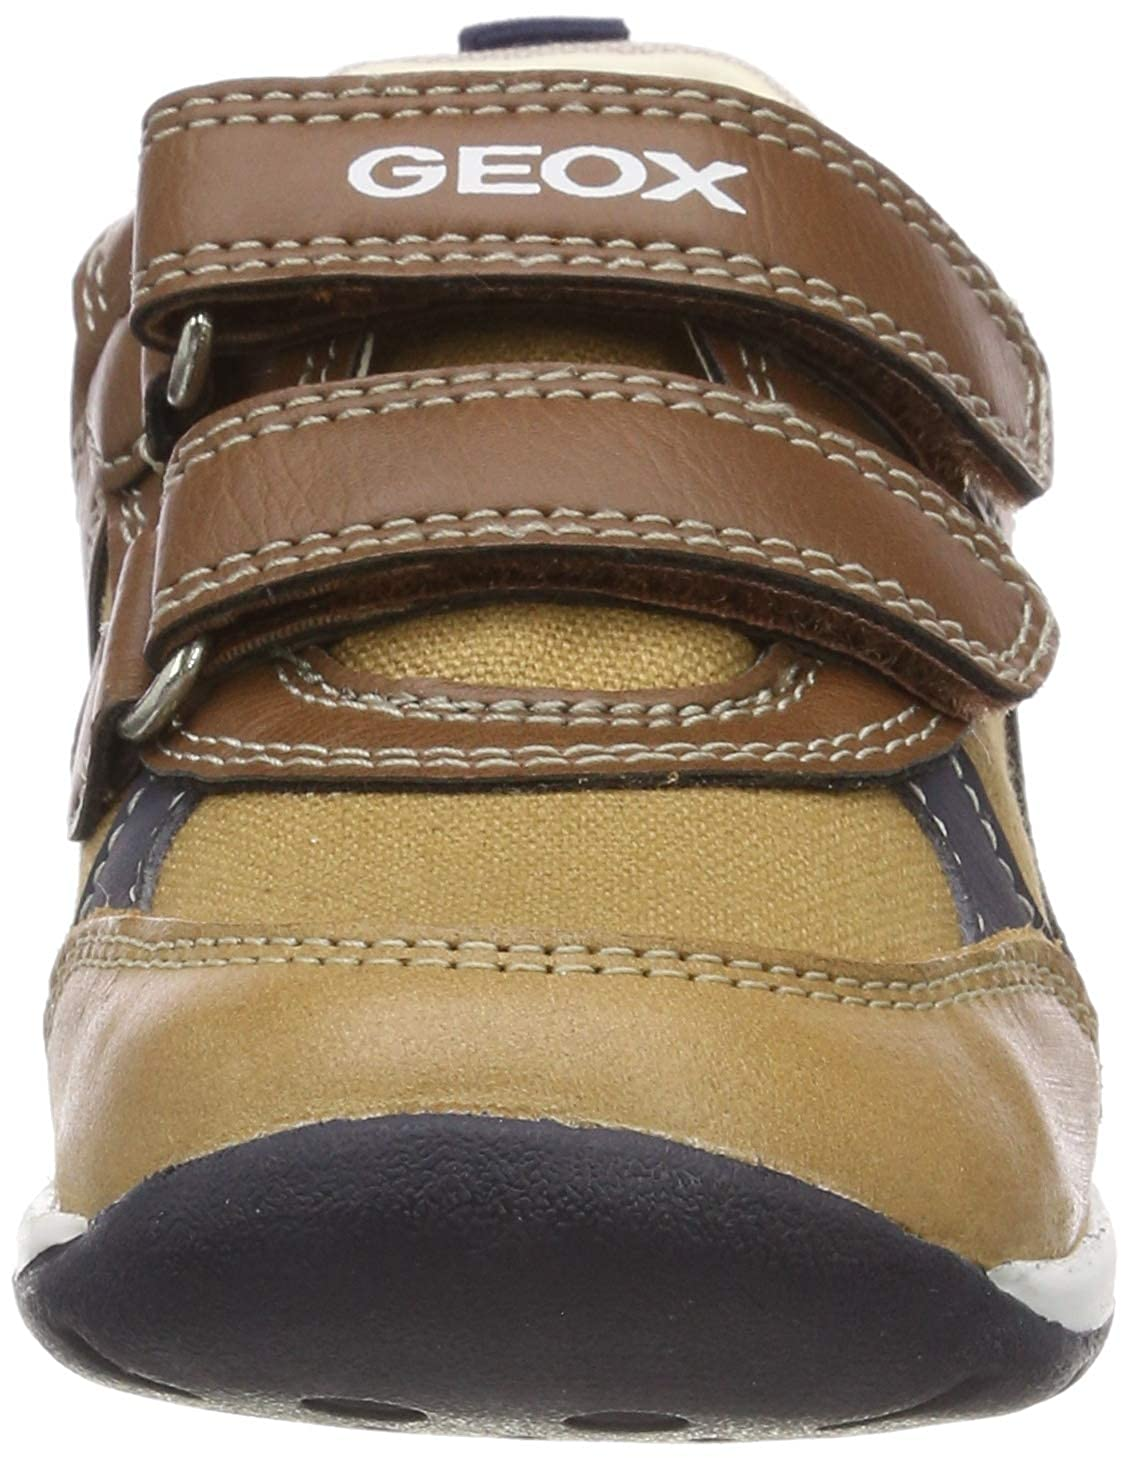 Geox B Each Boy D Baskets Basses b/éb/é gar/çon